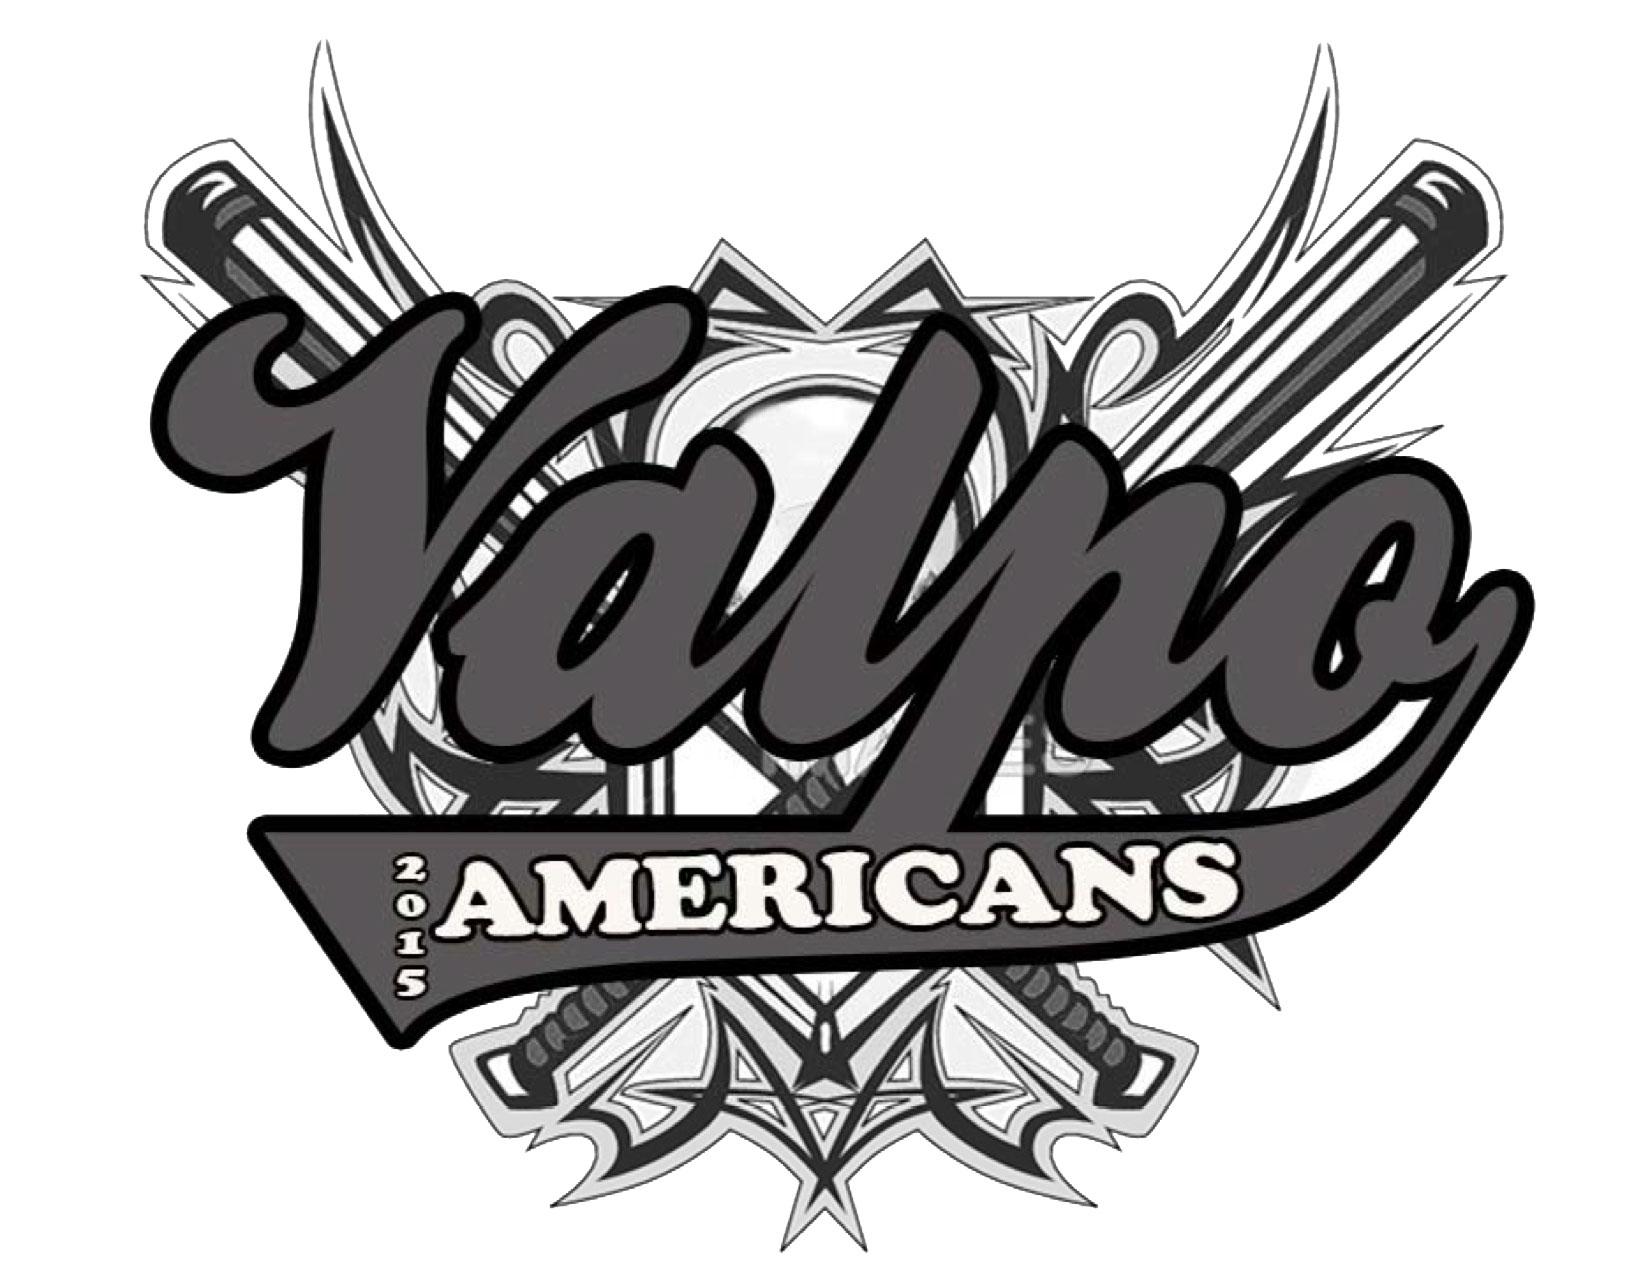 Valpo-Americans